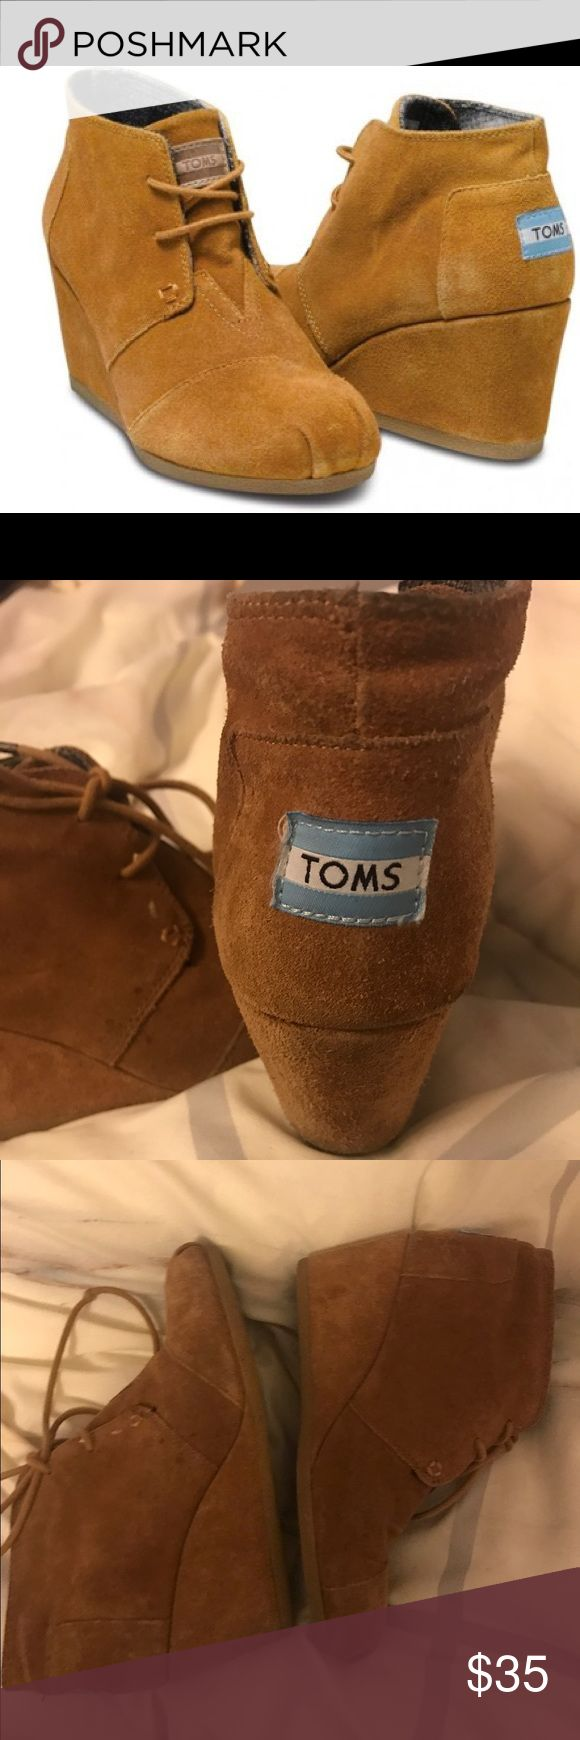 Toms Desert Suede Wedges in Chestnut Toms Chestnut Desert Suede Wedges size 7 TOMS Shoes Wedges